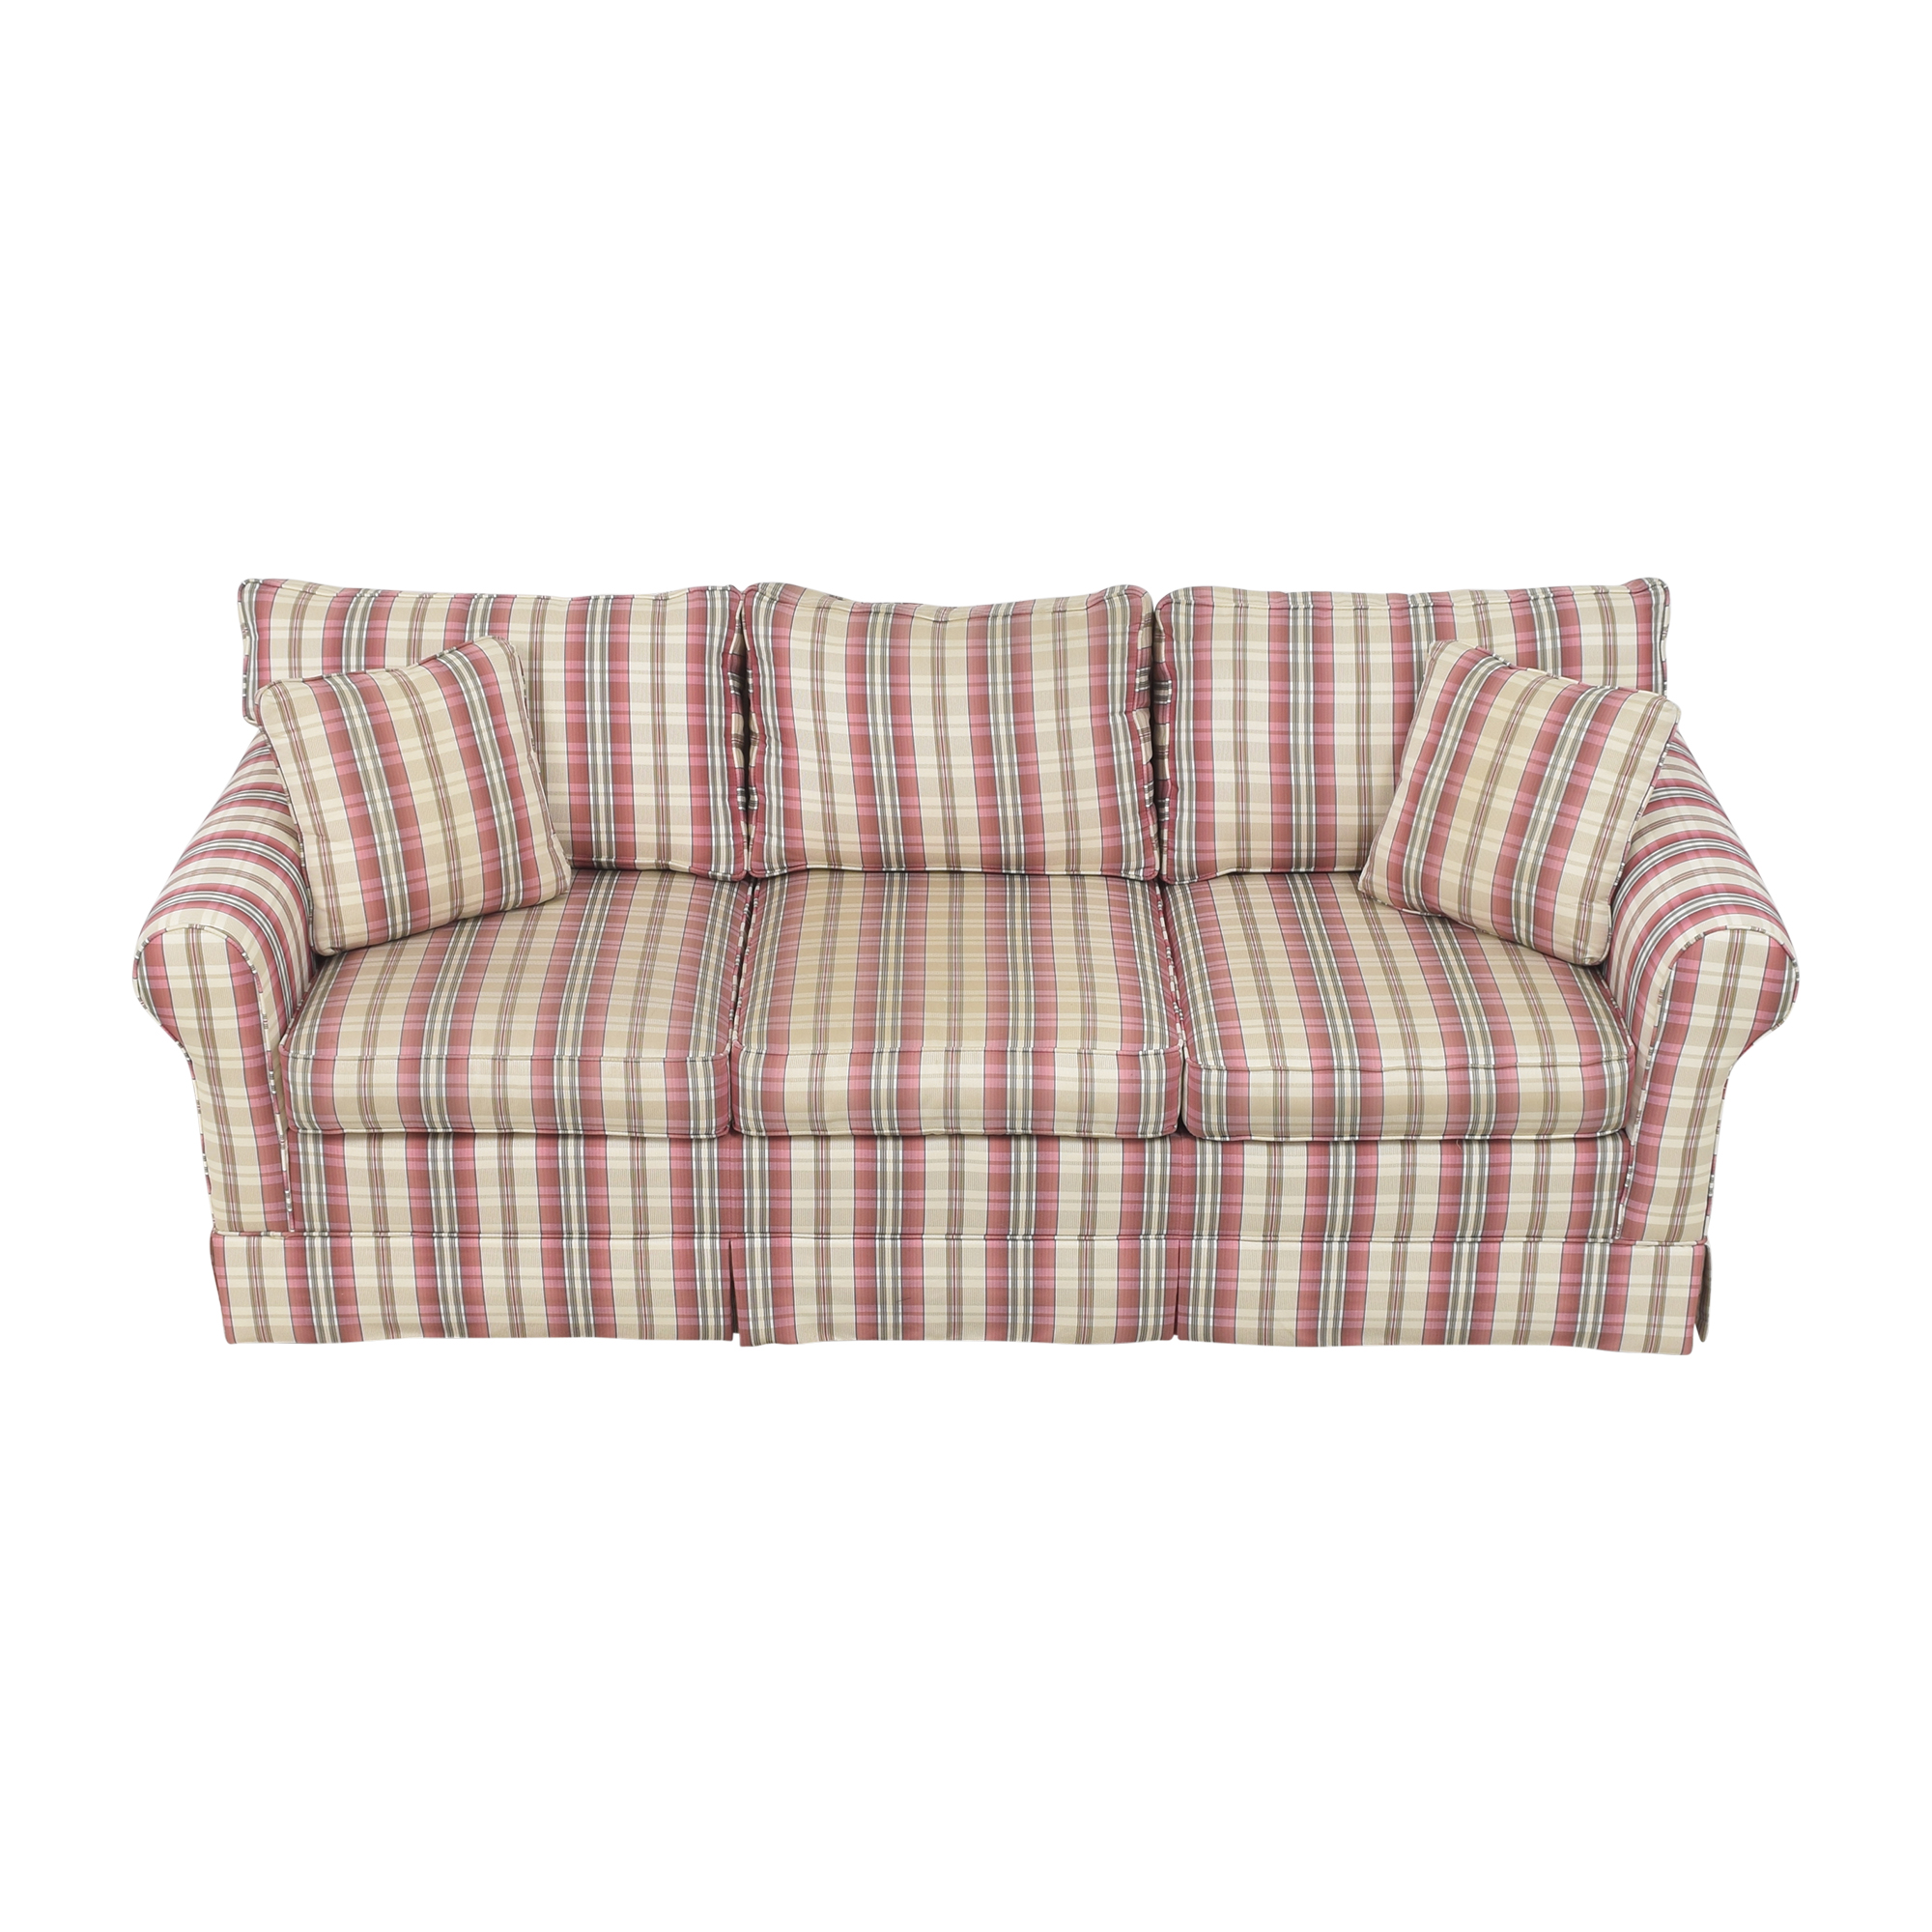 Choice Seating Gallery Choice Seating Gallery Skirted Three Cushion Sofa price